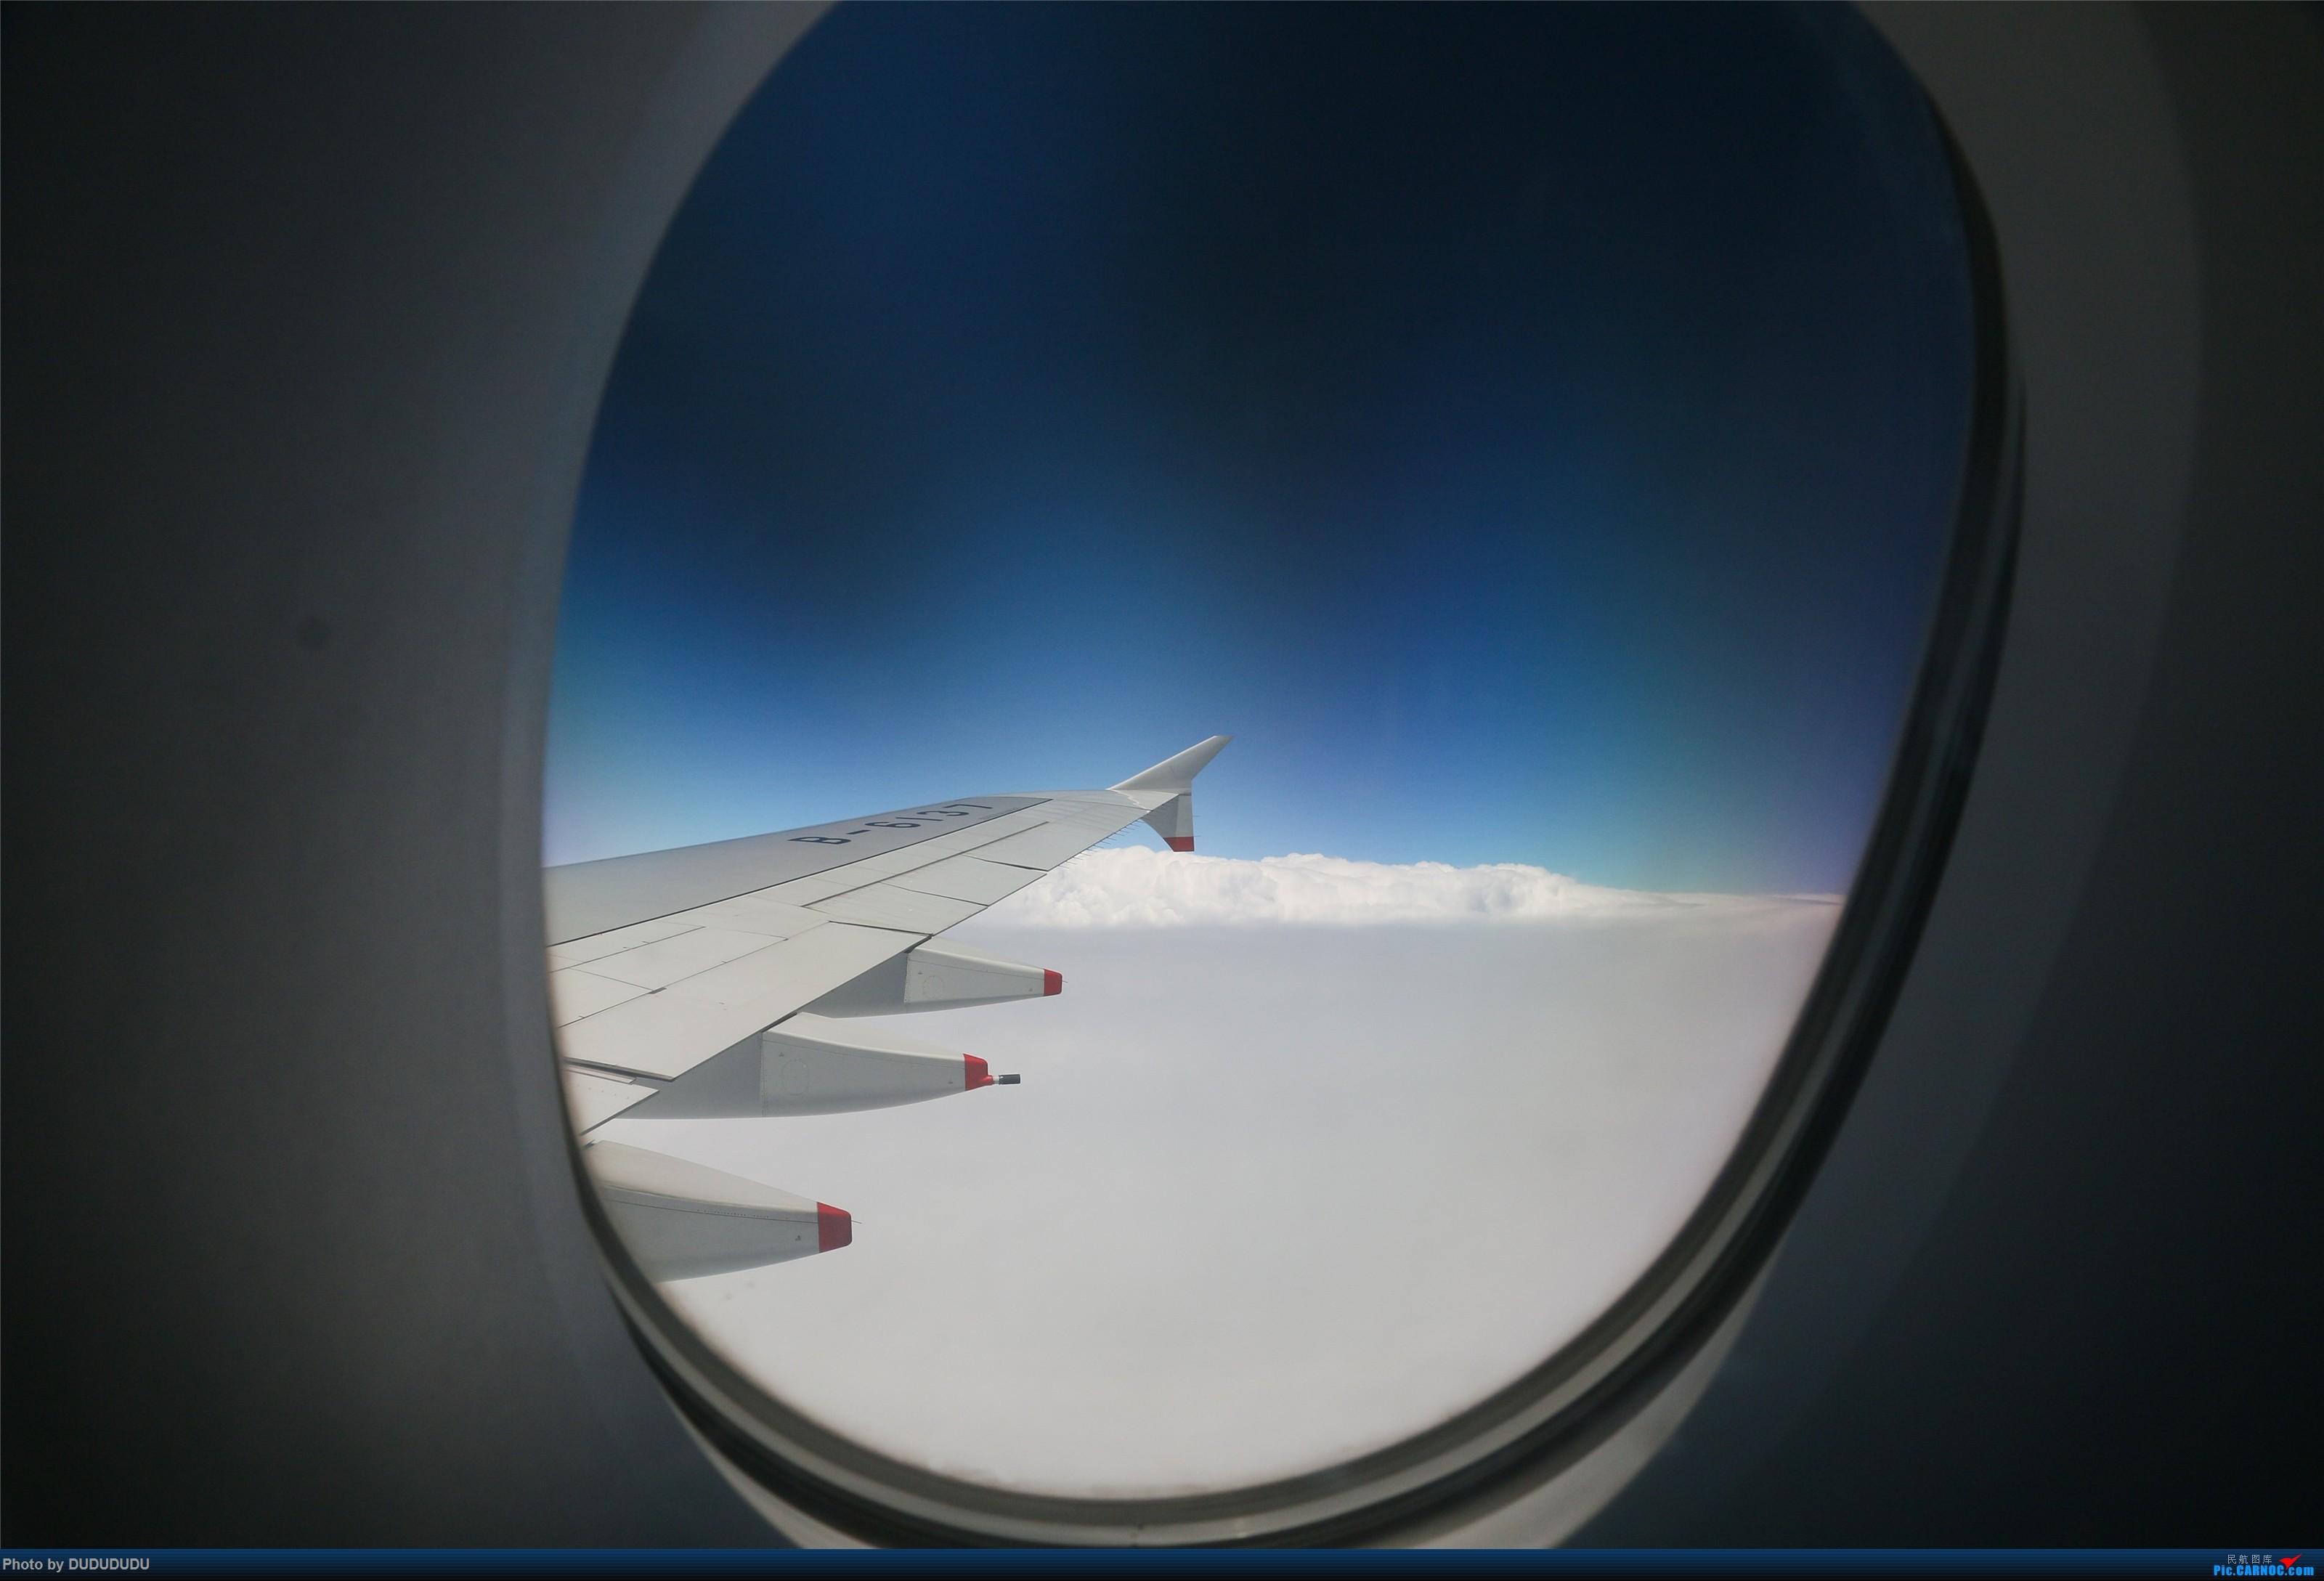 Re:[原创]【DUDUDUDU】从小白走来的这一年…… AIRBUS A380 B-6137 中国北京首都国际机场